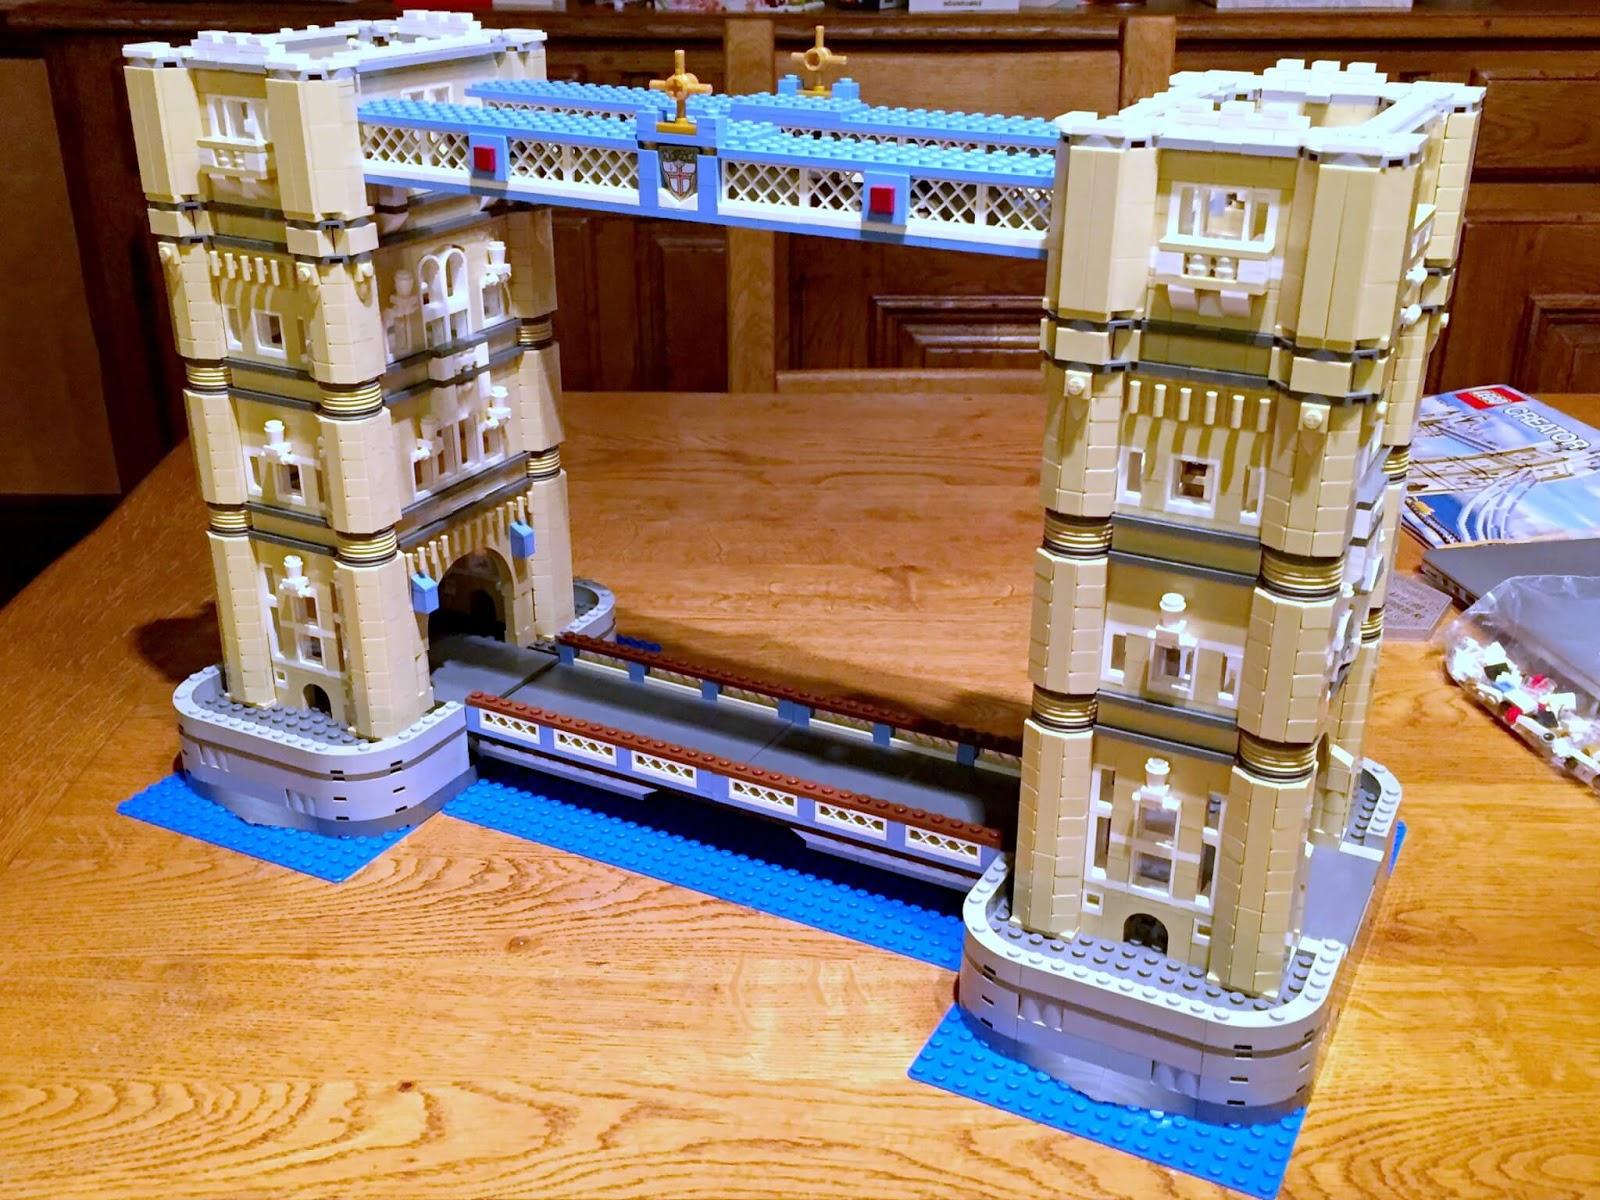 Building Lego Tower Bridge 10214 | Connecting the upper walkway.